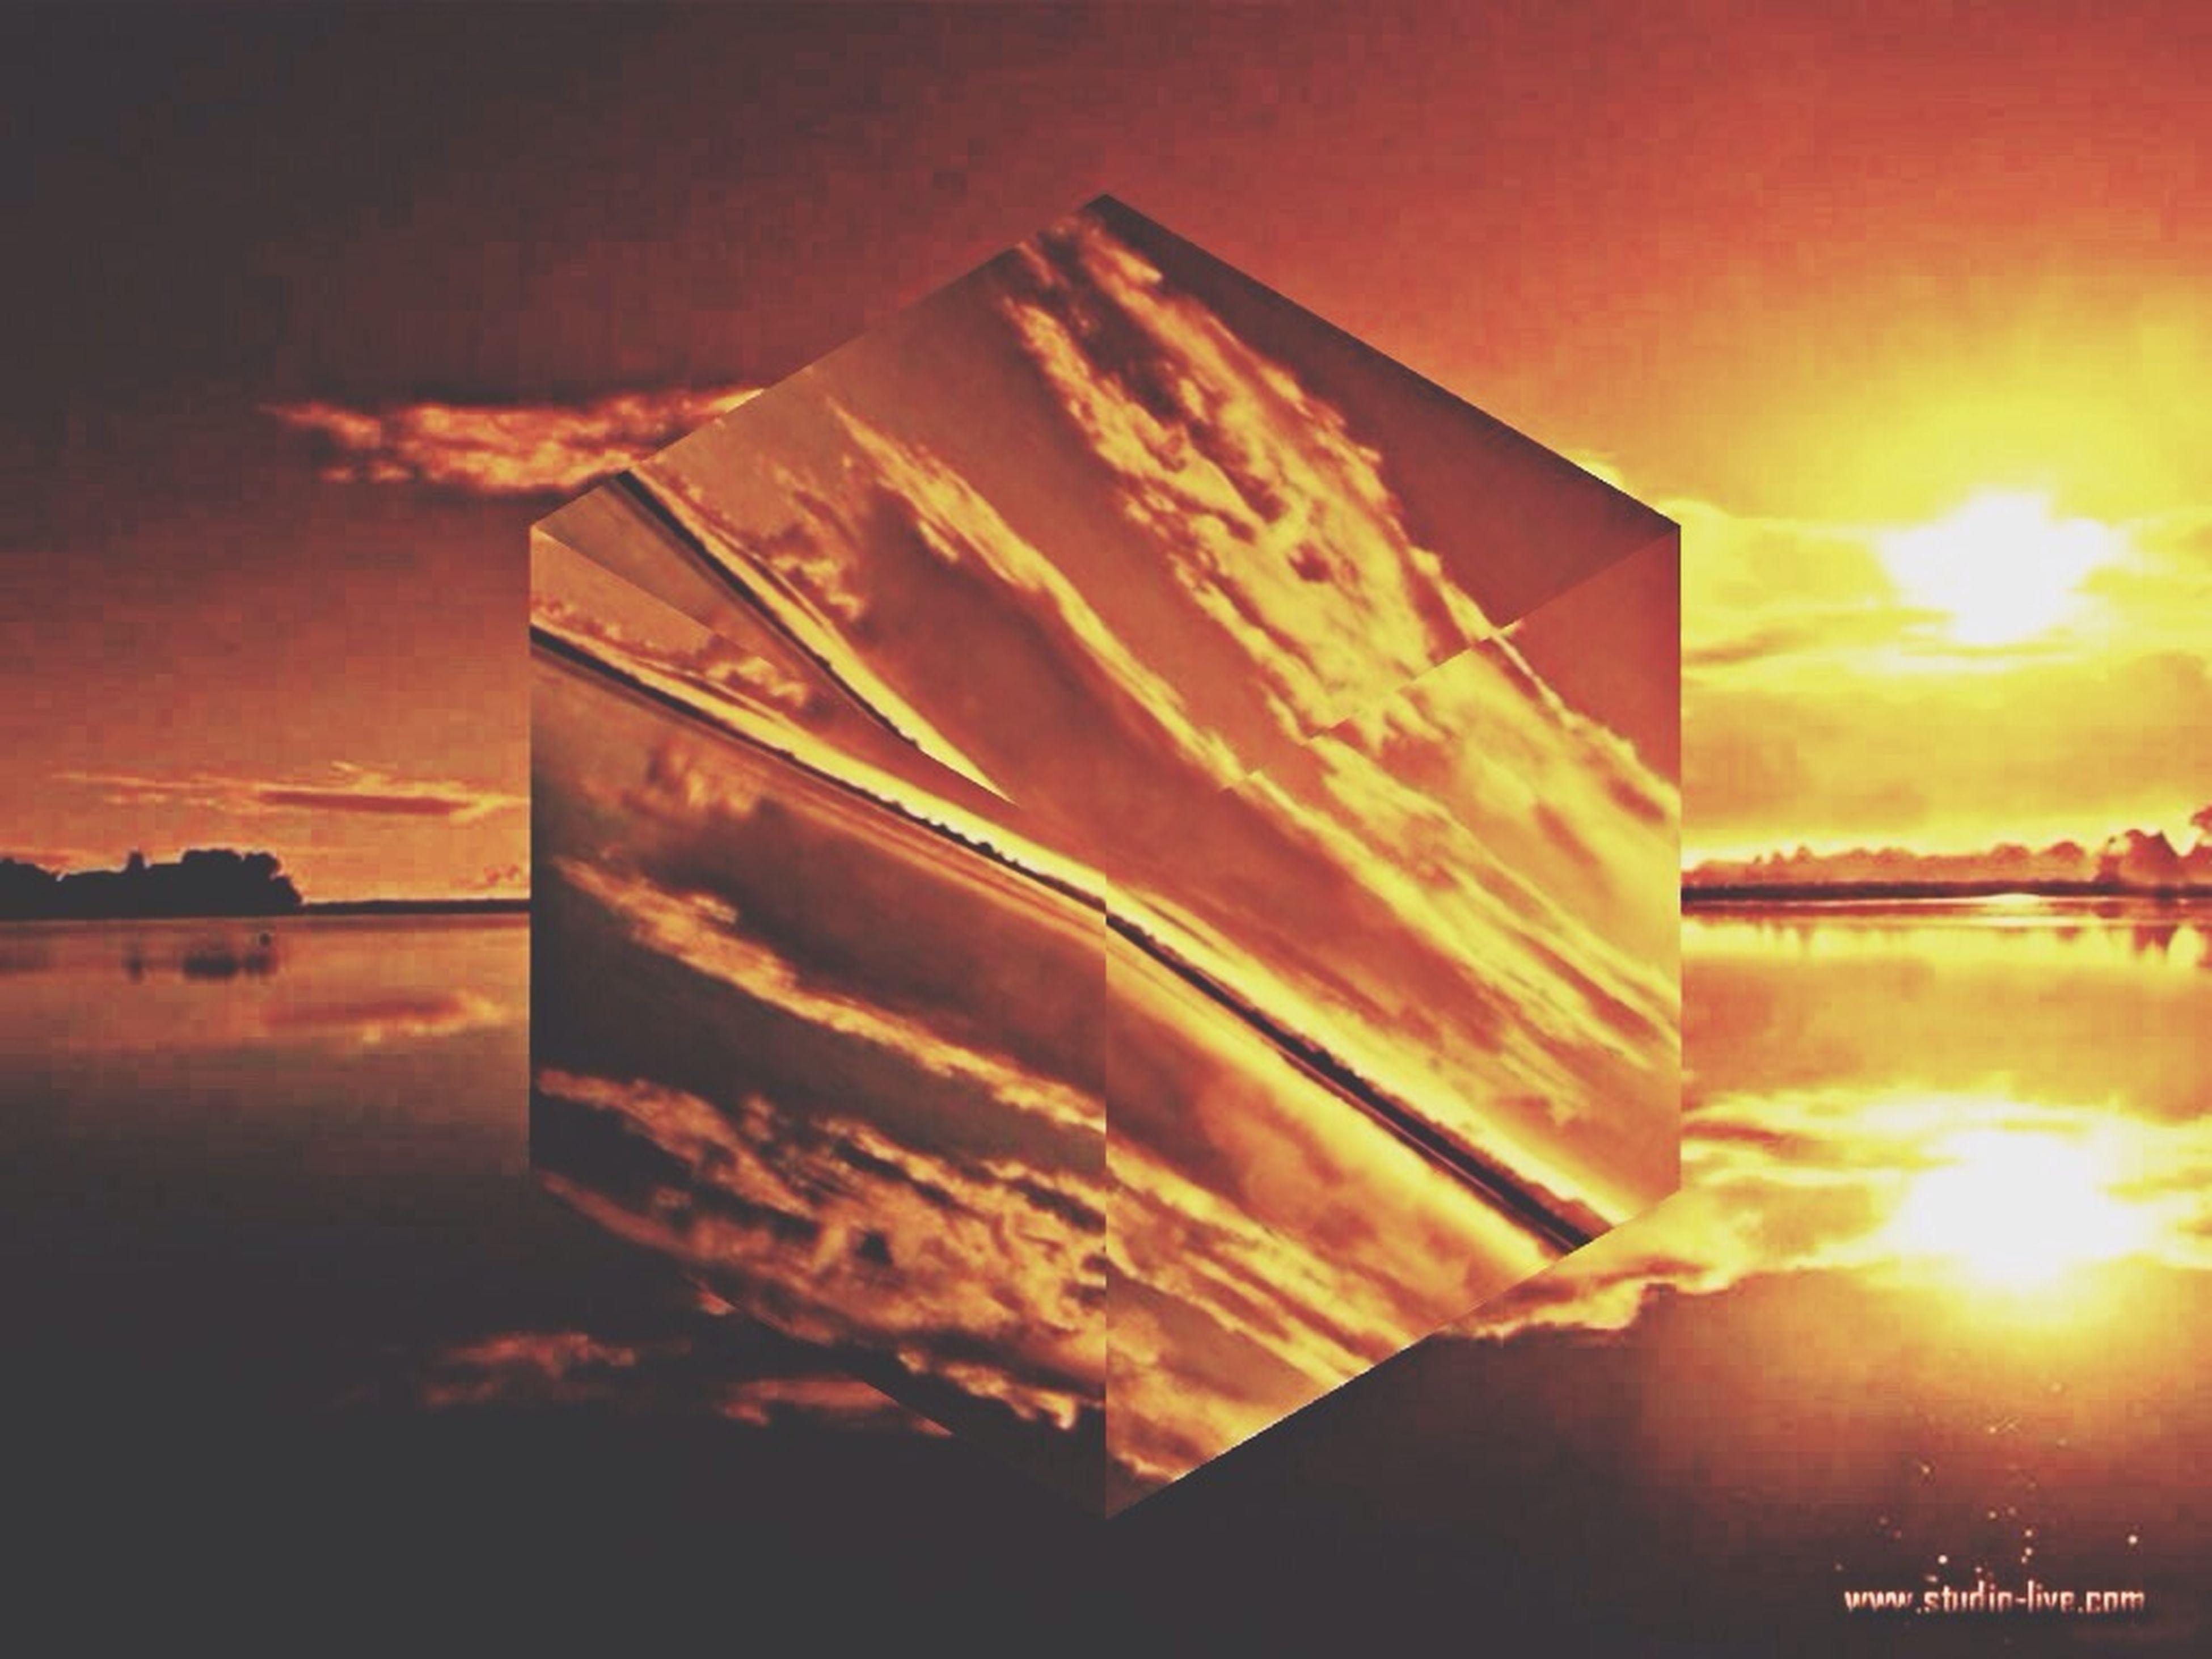 sunset, architecture, built structure, sun, water, building exterior, sky, reflection, sunbeam, sunlight, sea, waterfront, lens flare, orange color, outdoors, nature, no people, dusk, river, scenics